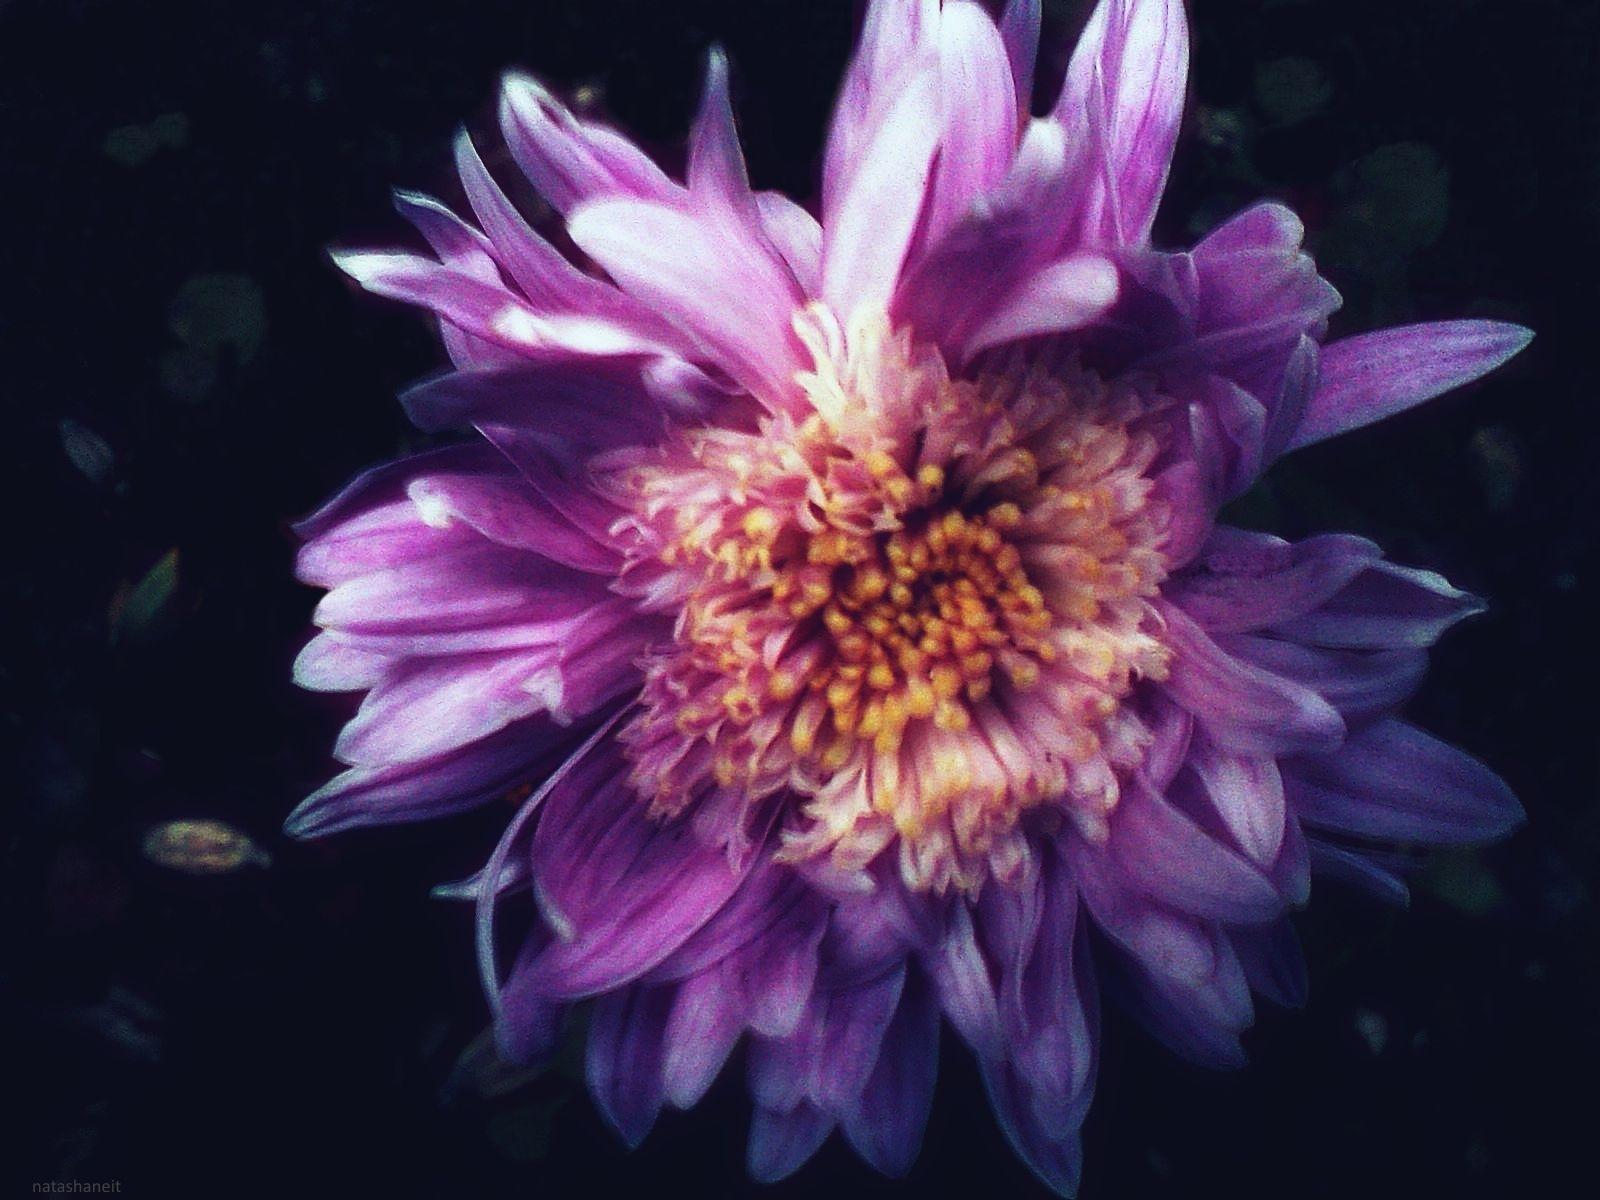 Chrysanthemum by natashaneit